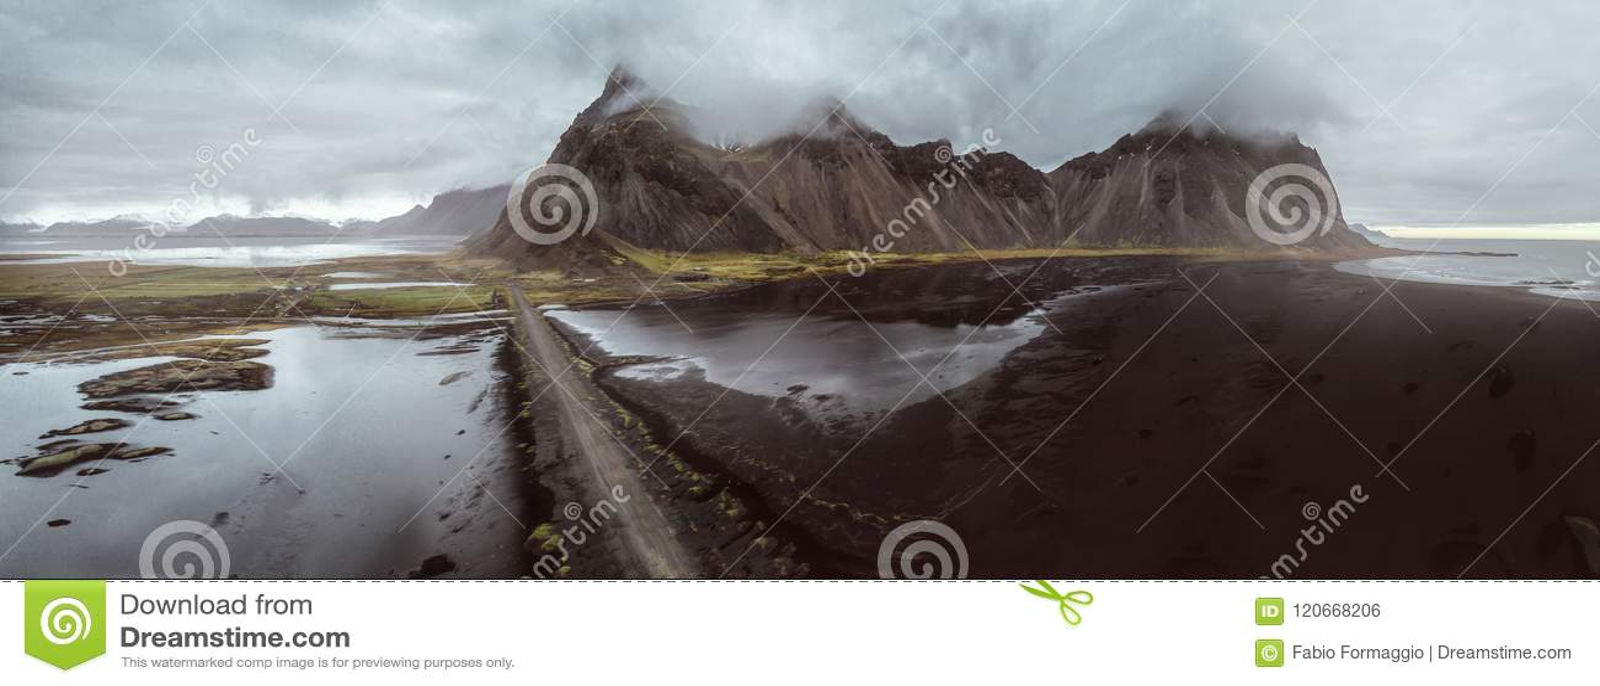 Panoramas islandêses, vista aérea nas terras